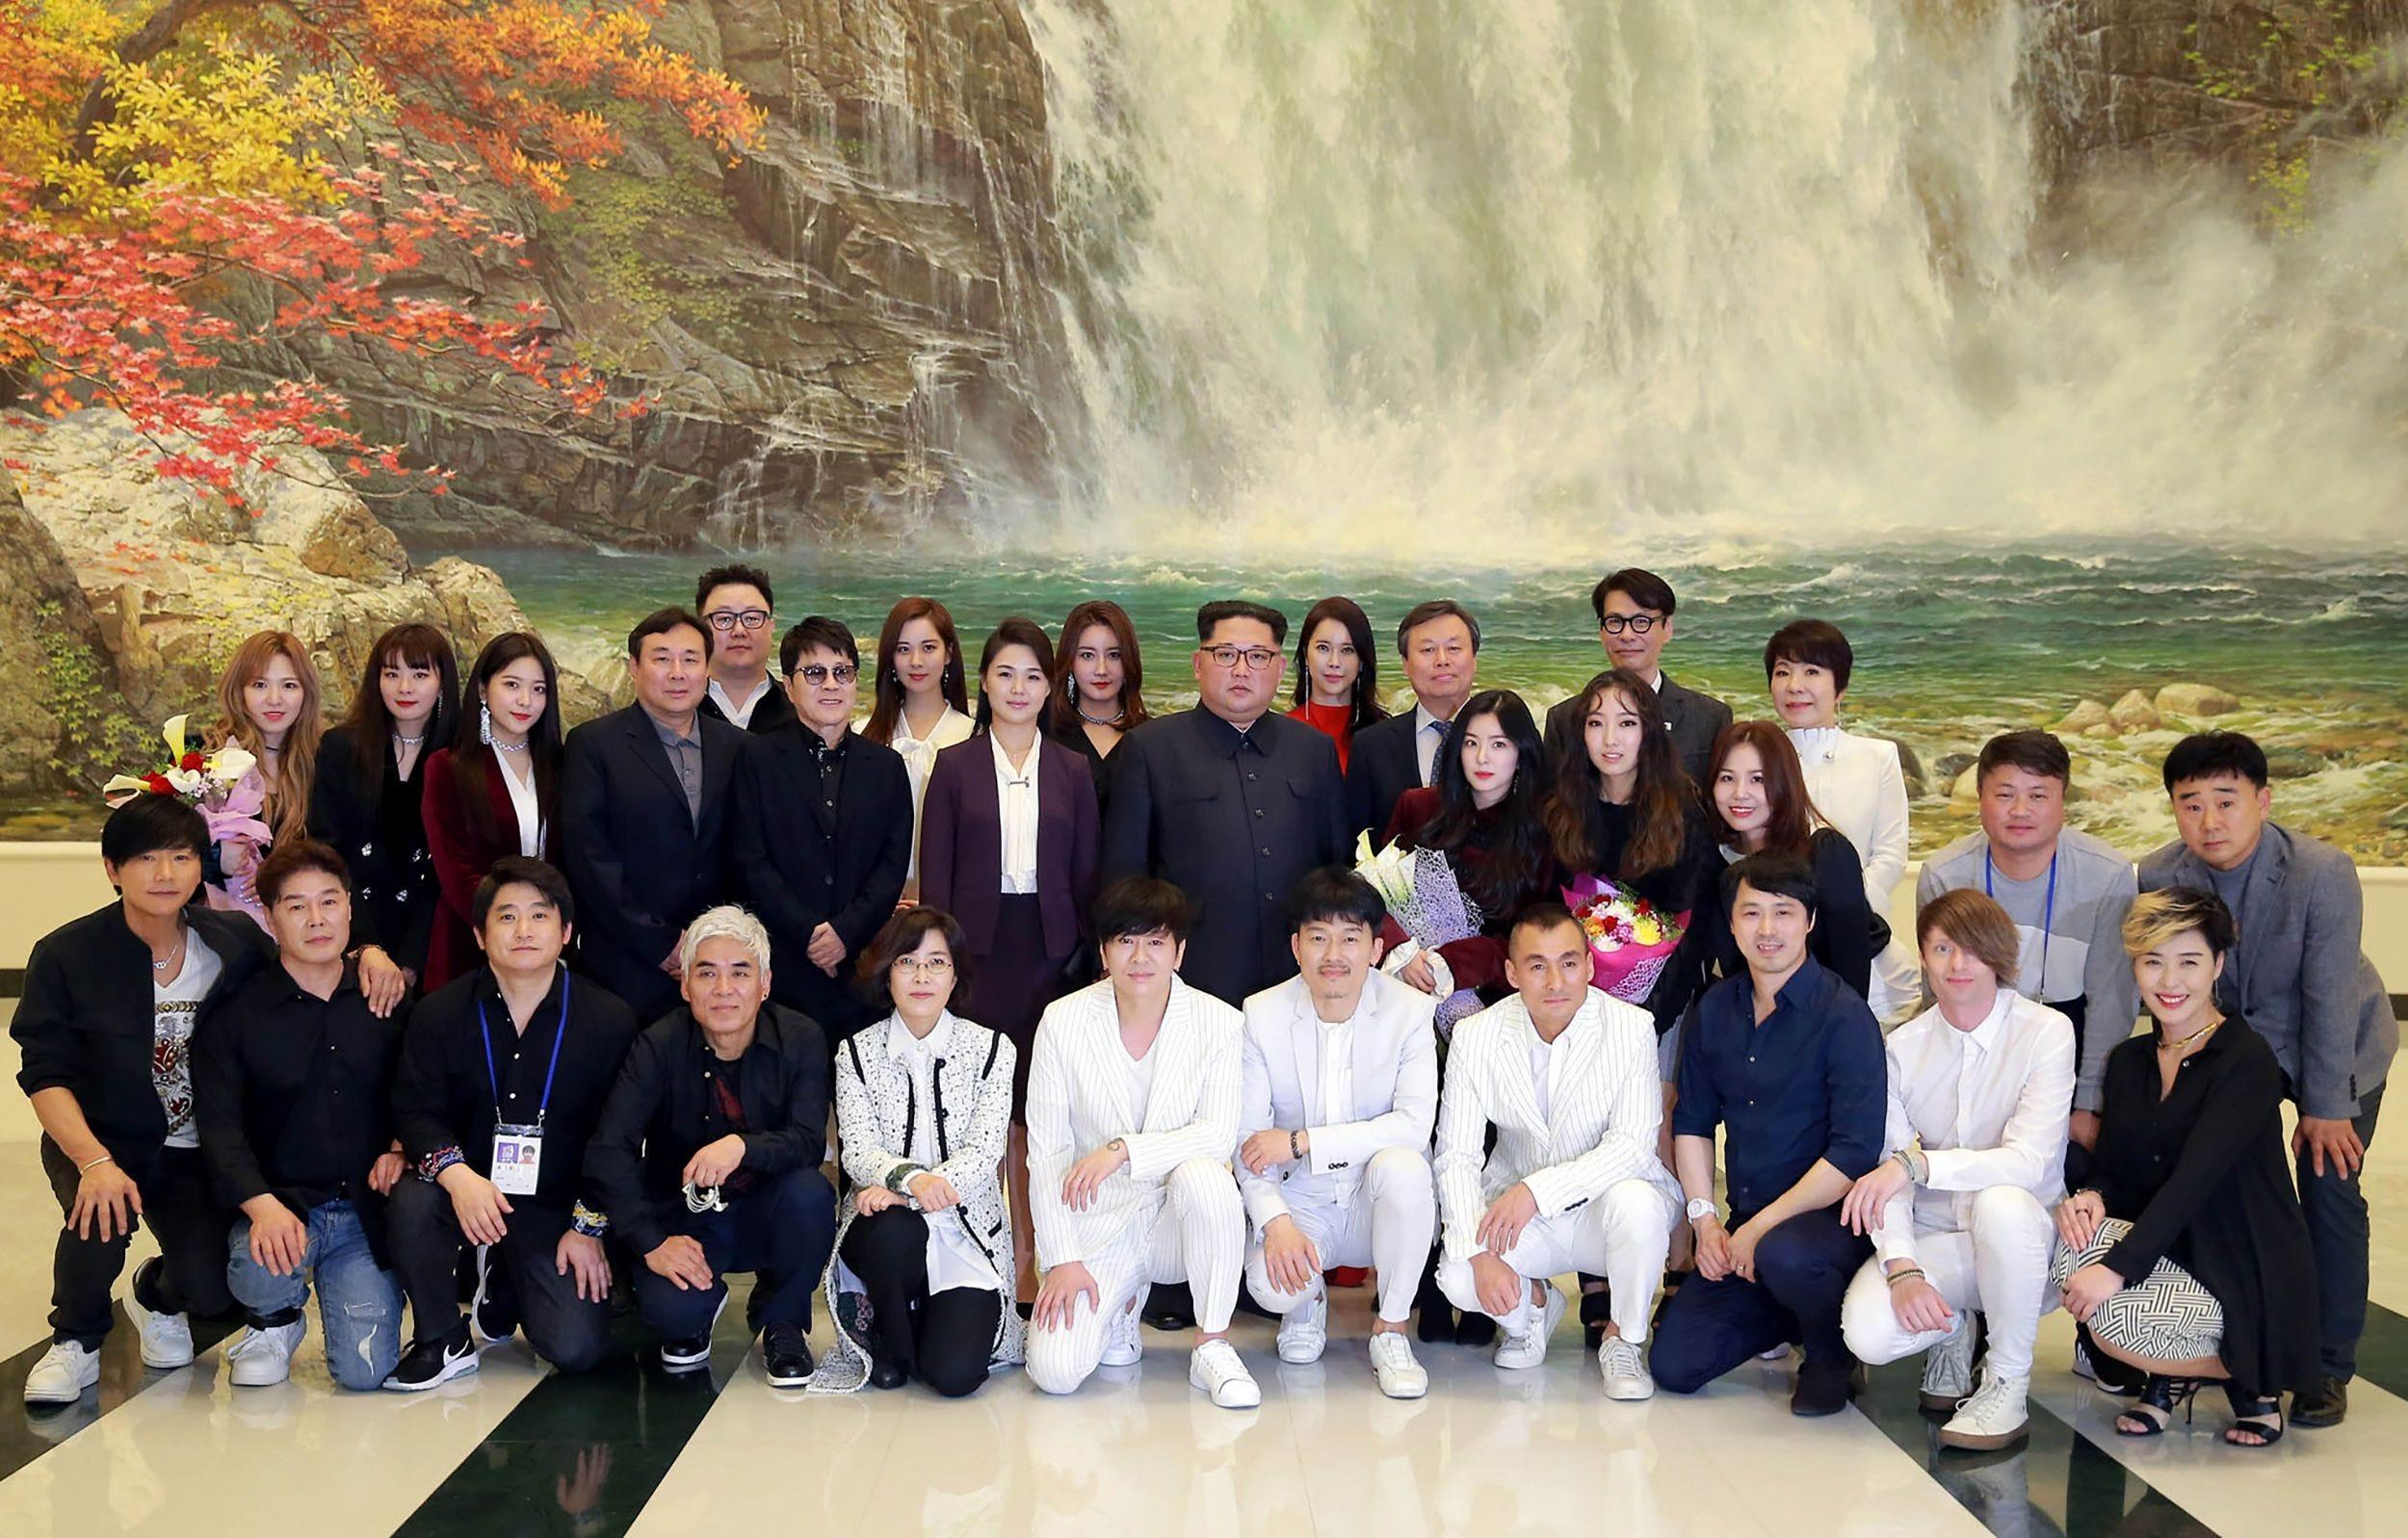 Kim Jong Un likes K-pop music,